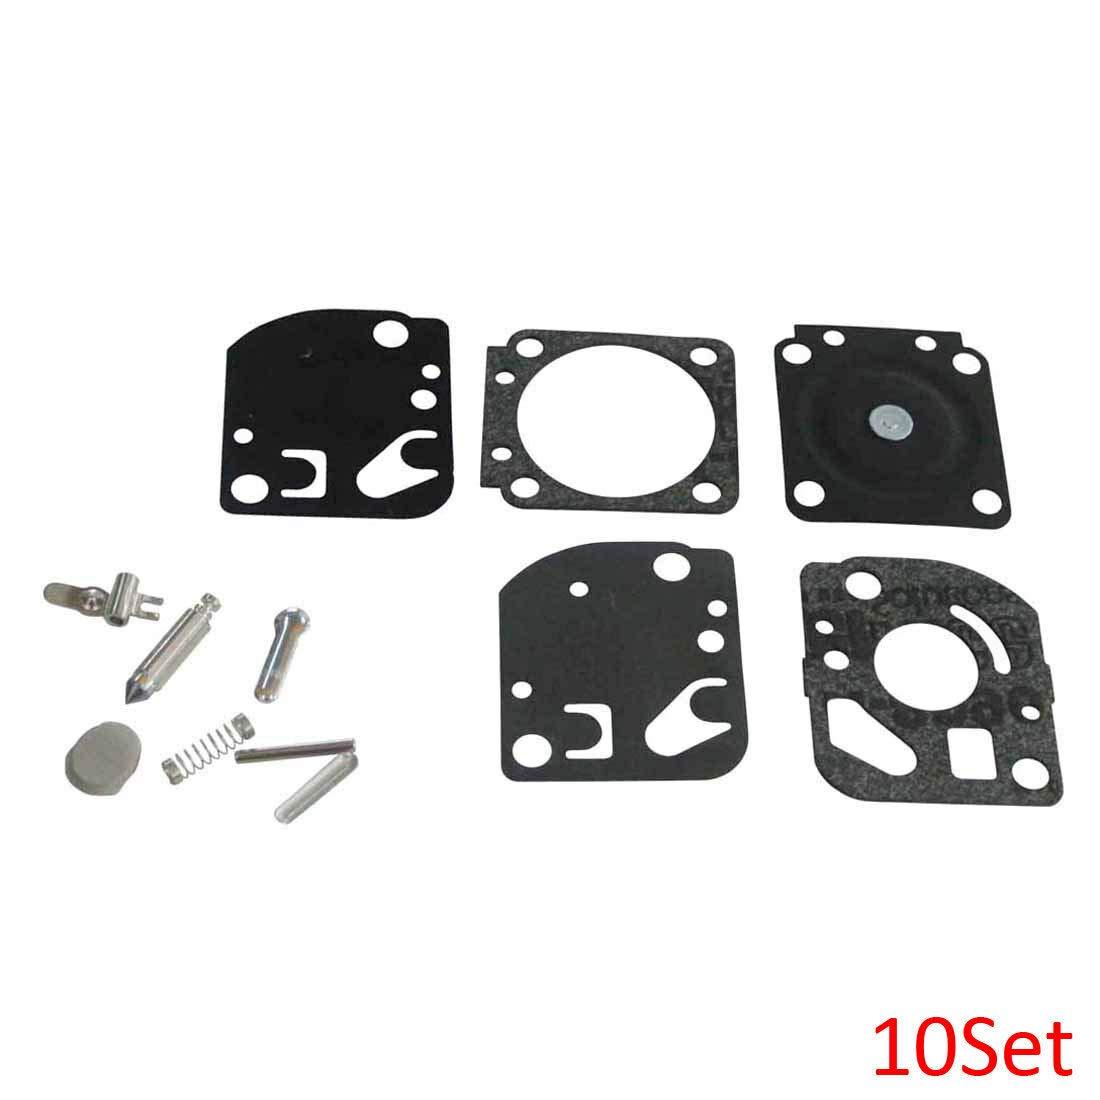 FidgetKute Carb kit RB-20 for Homelite ST155 ST175 ST285 ST385 HB-180 & A03979 10 Sets